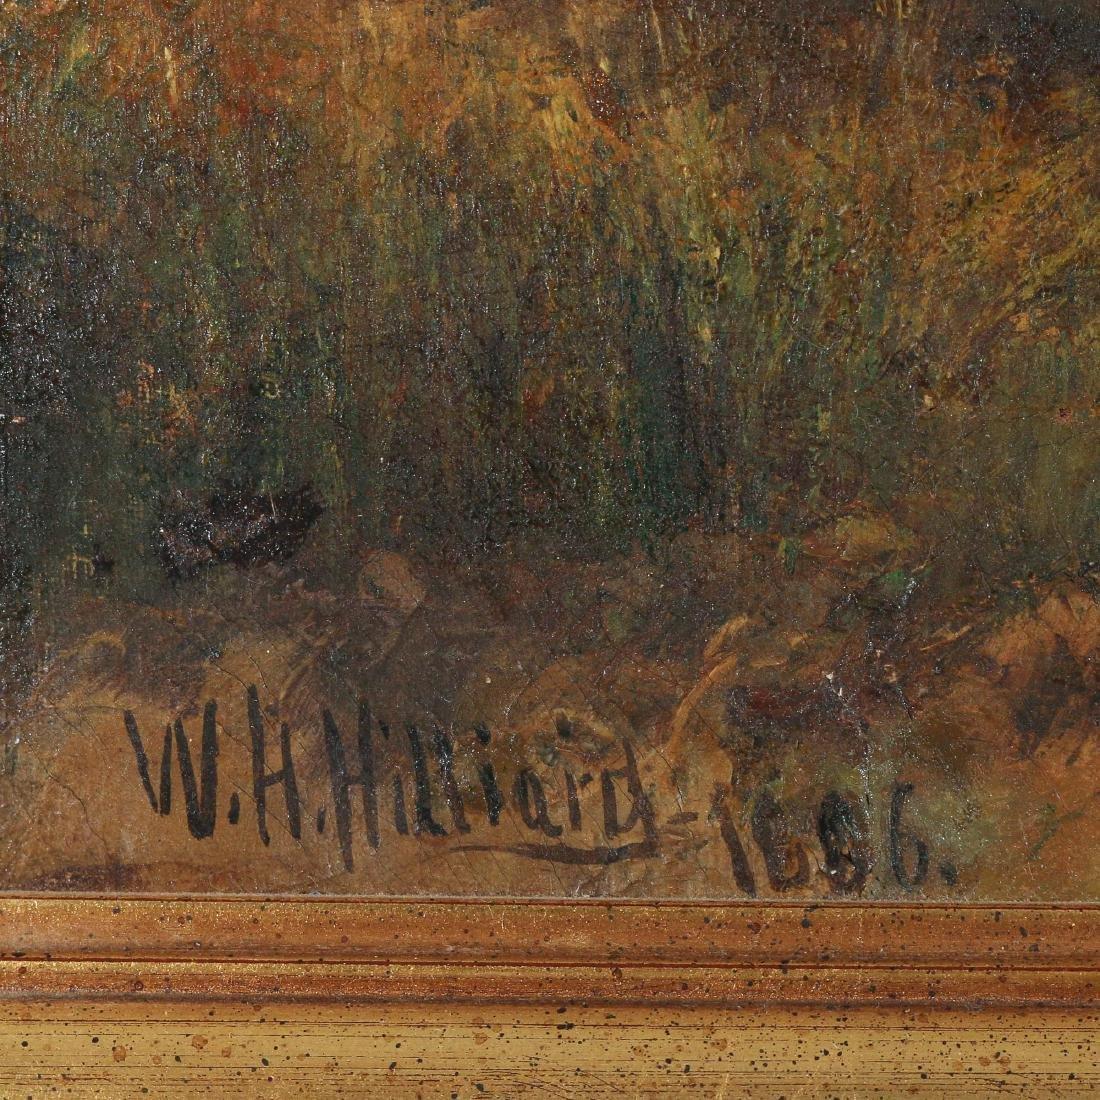 WILLIAM HENRY HILLIARD (American, 1836-1905) - 7